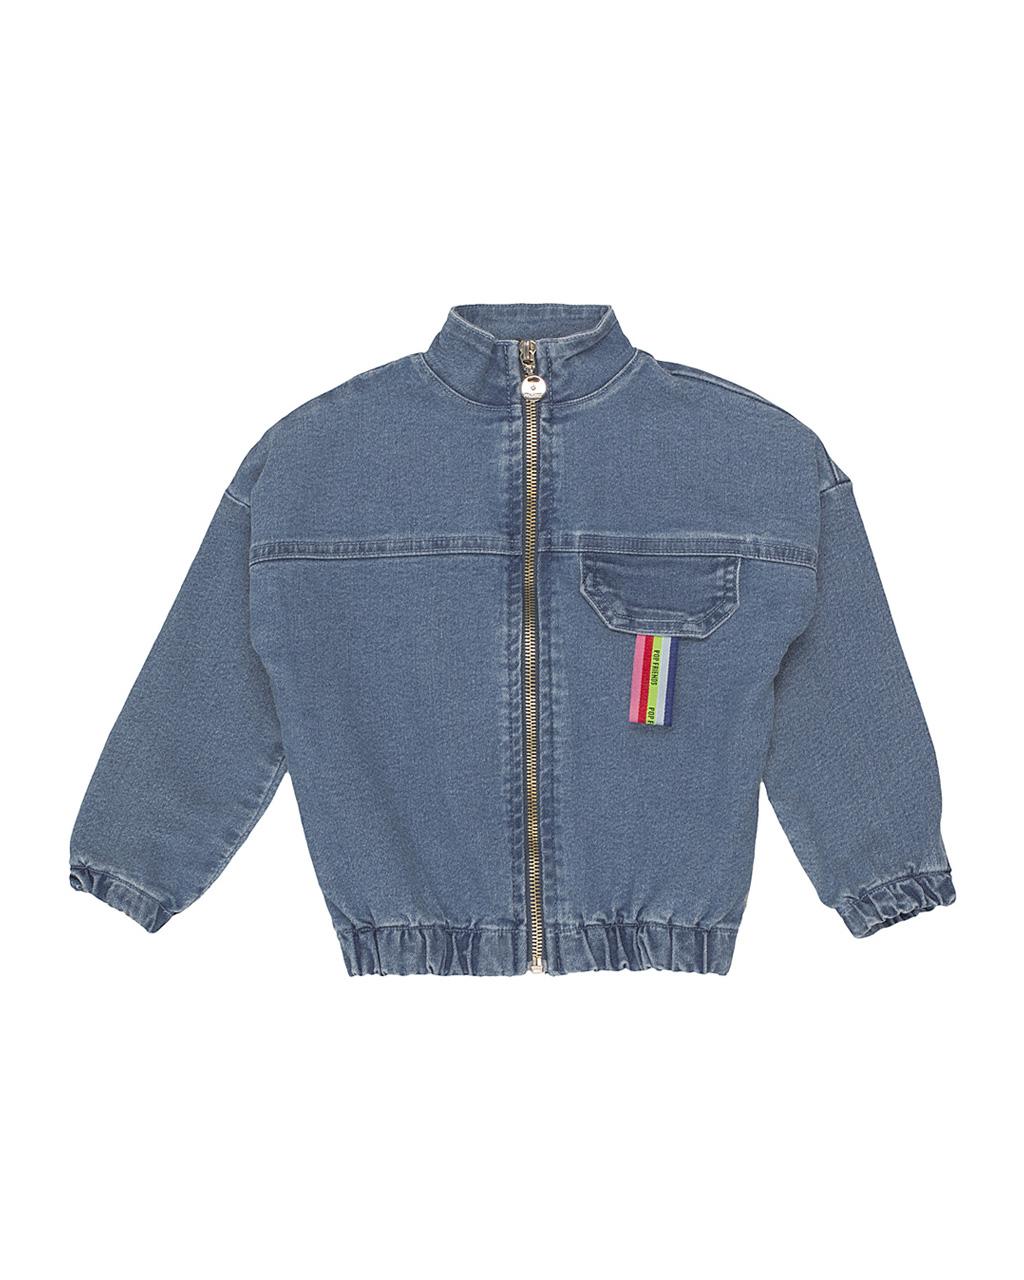 Jaqueta Jeans Infantil com Bolso fake Momi